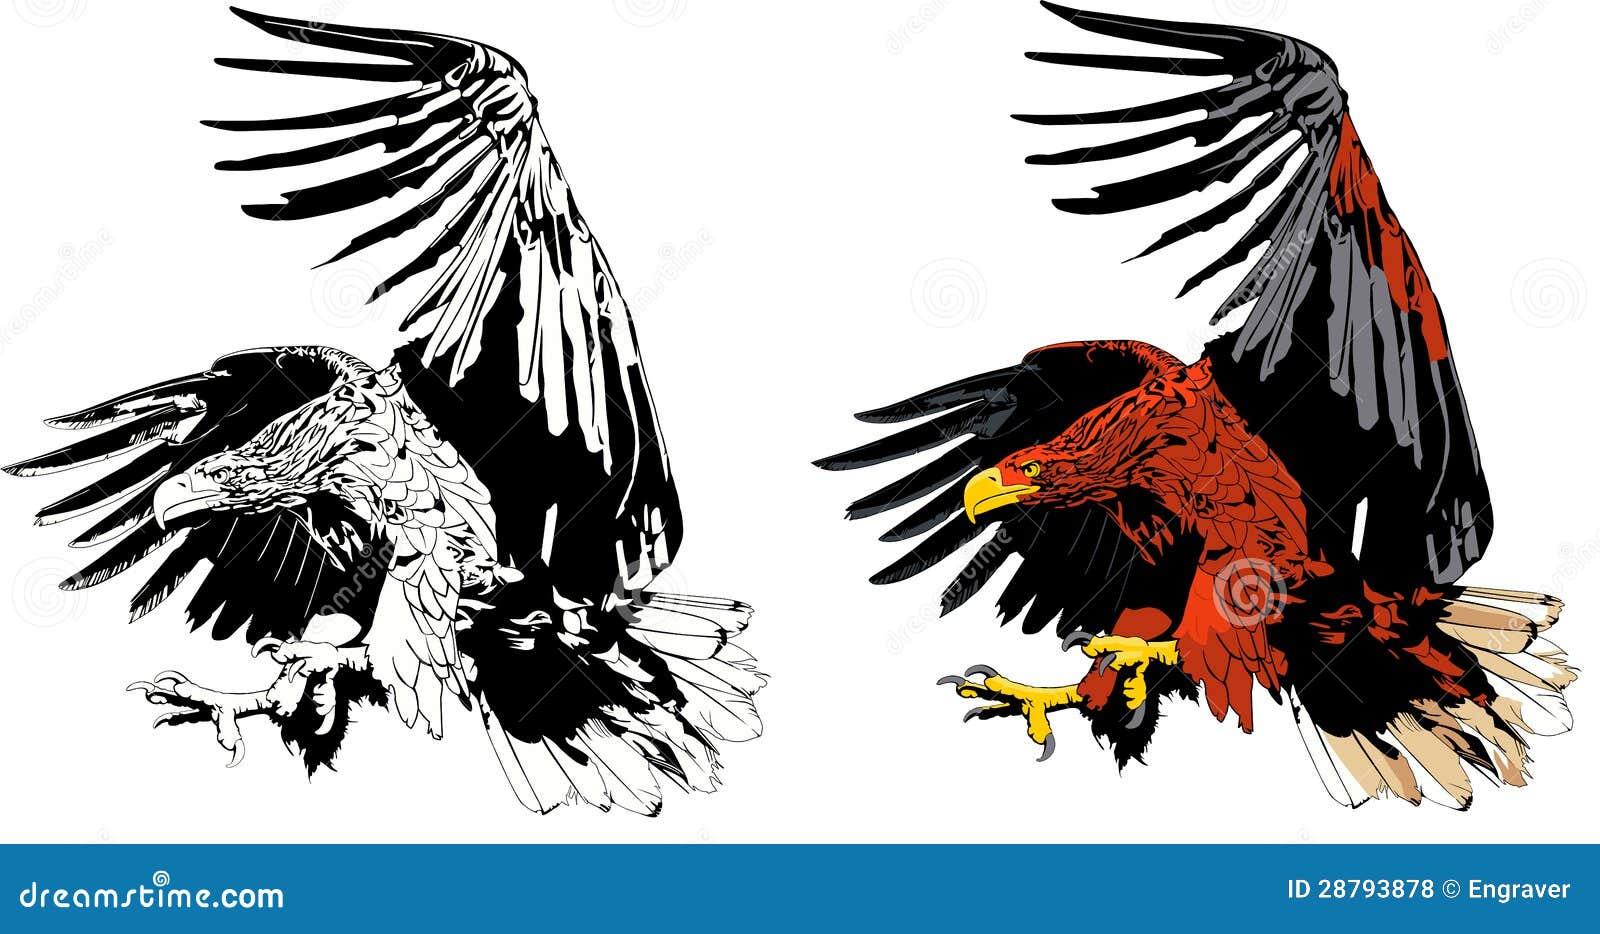 eagle attack royalty free stock photos image 28793878